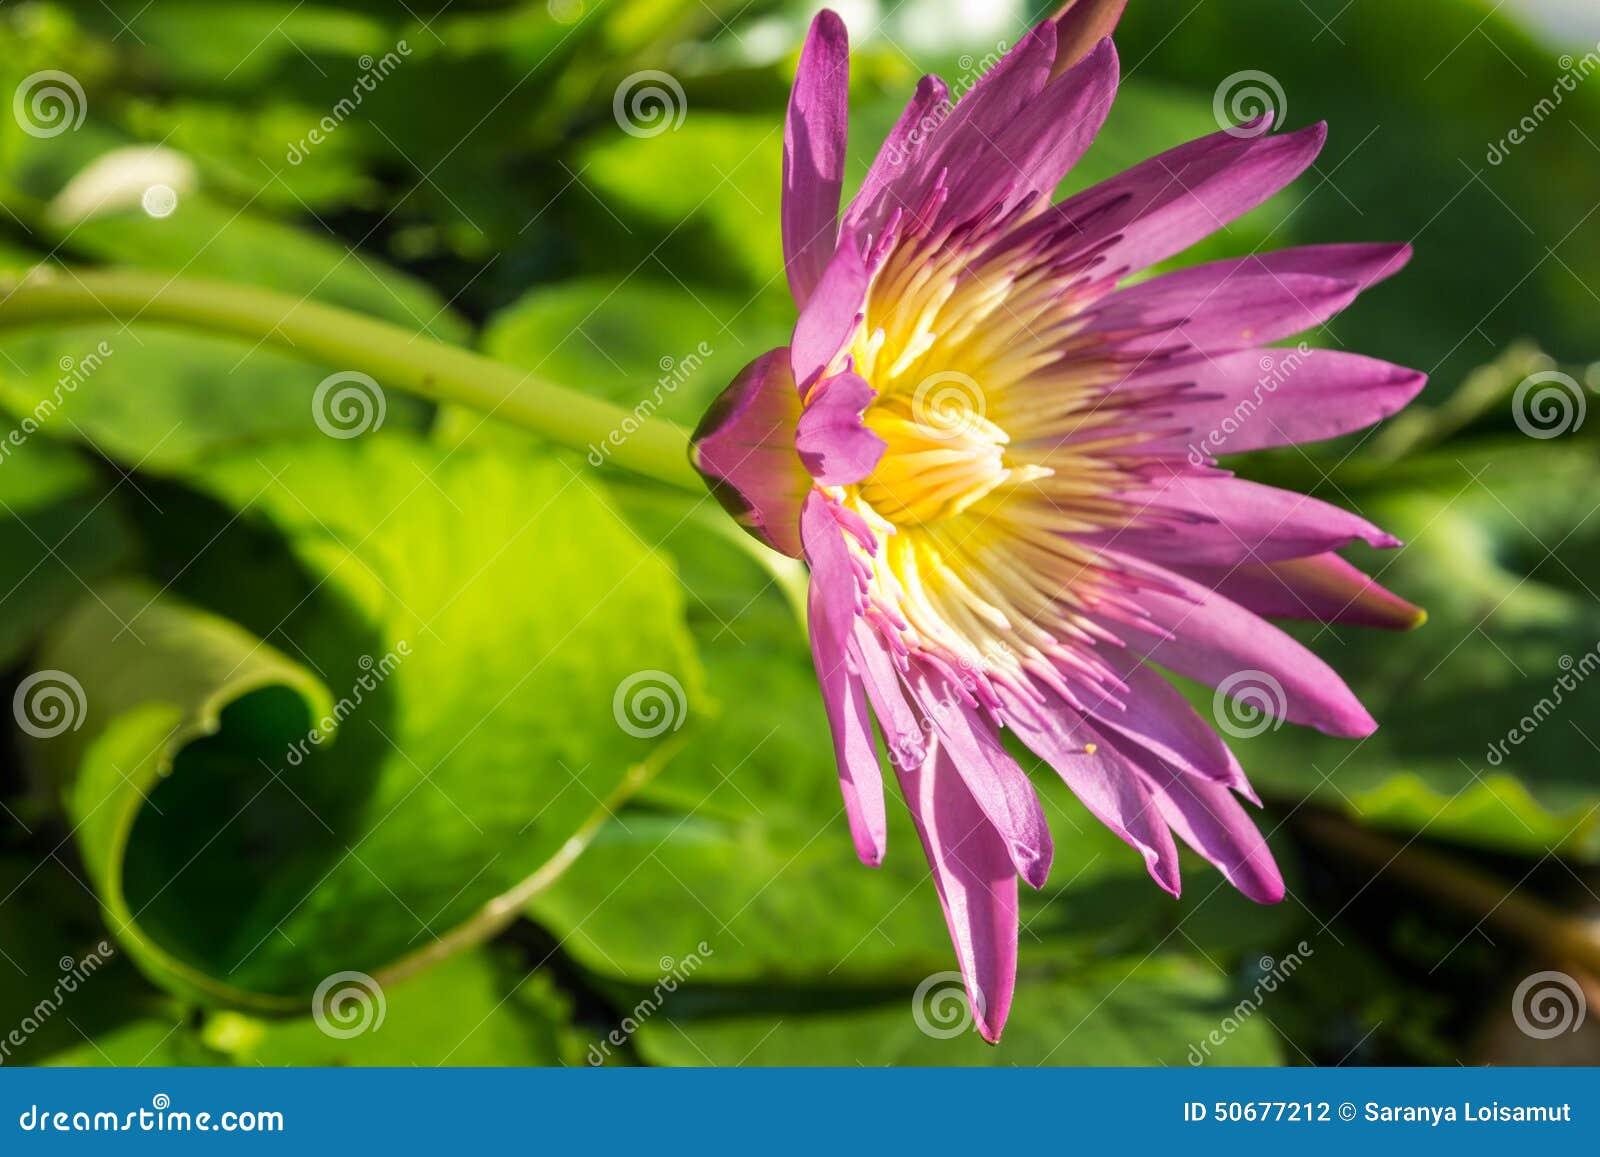 Download 开花莲花 库存照片. 图片 包括有 几天, 自然, 花卉, 疲劳, 减少, 刷新, 开花的, 哺育, 玻色子 - 50677212